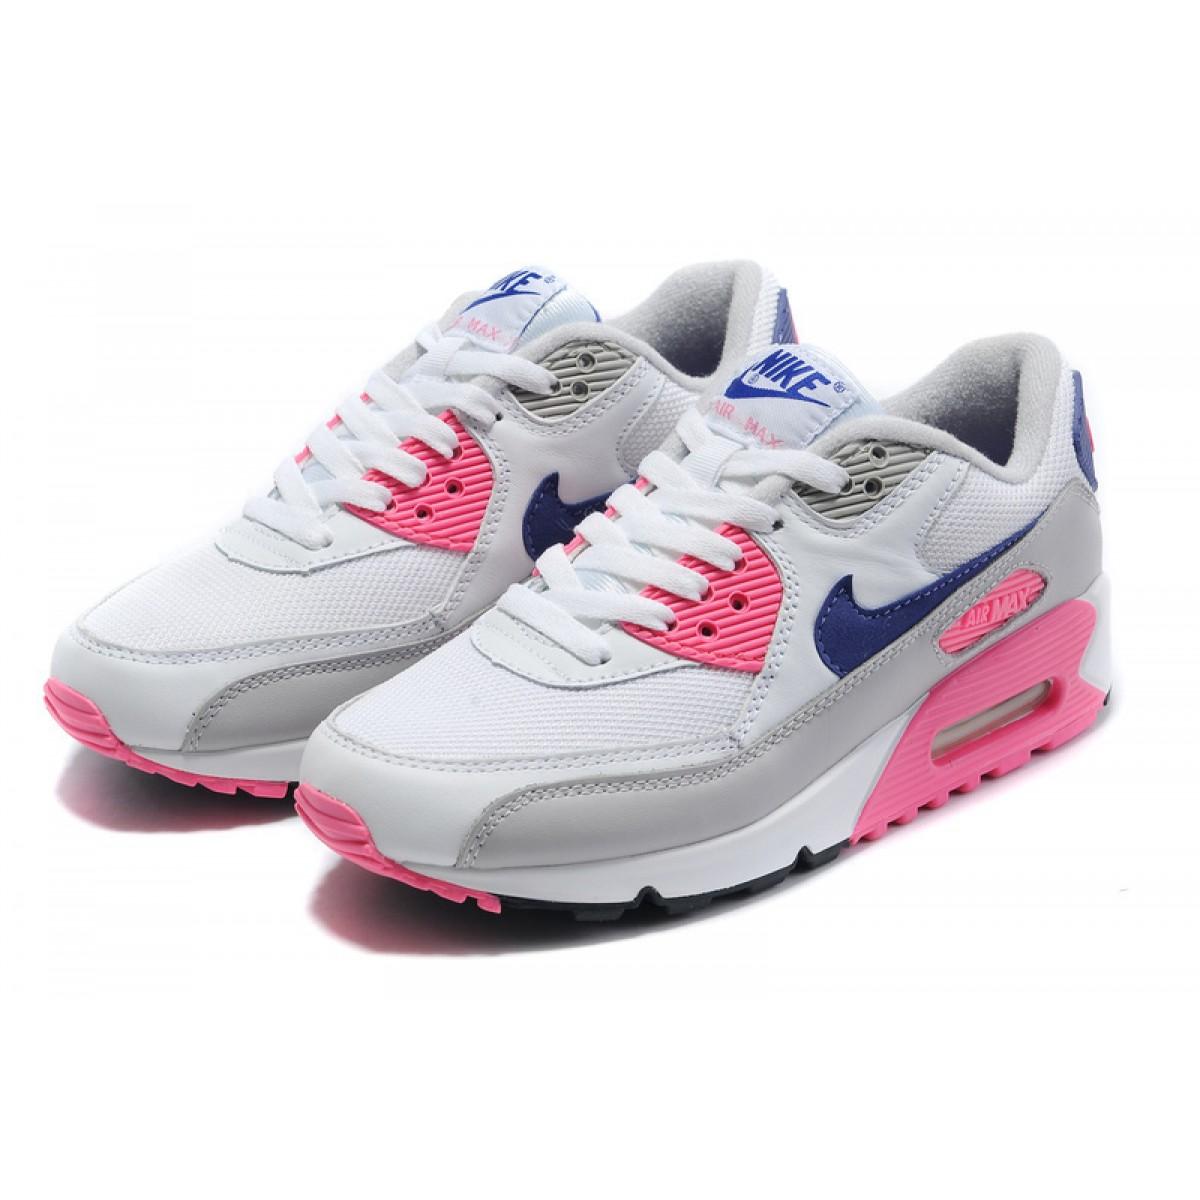 factory price 39e6f 2dc50 ... Pas Cher Chaussure-9875554 . Achat   Vente produits Nike Air Max 90  Femme Rose,Nike Air Max 90 Femme